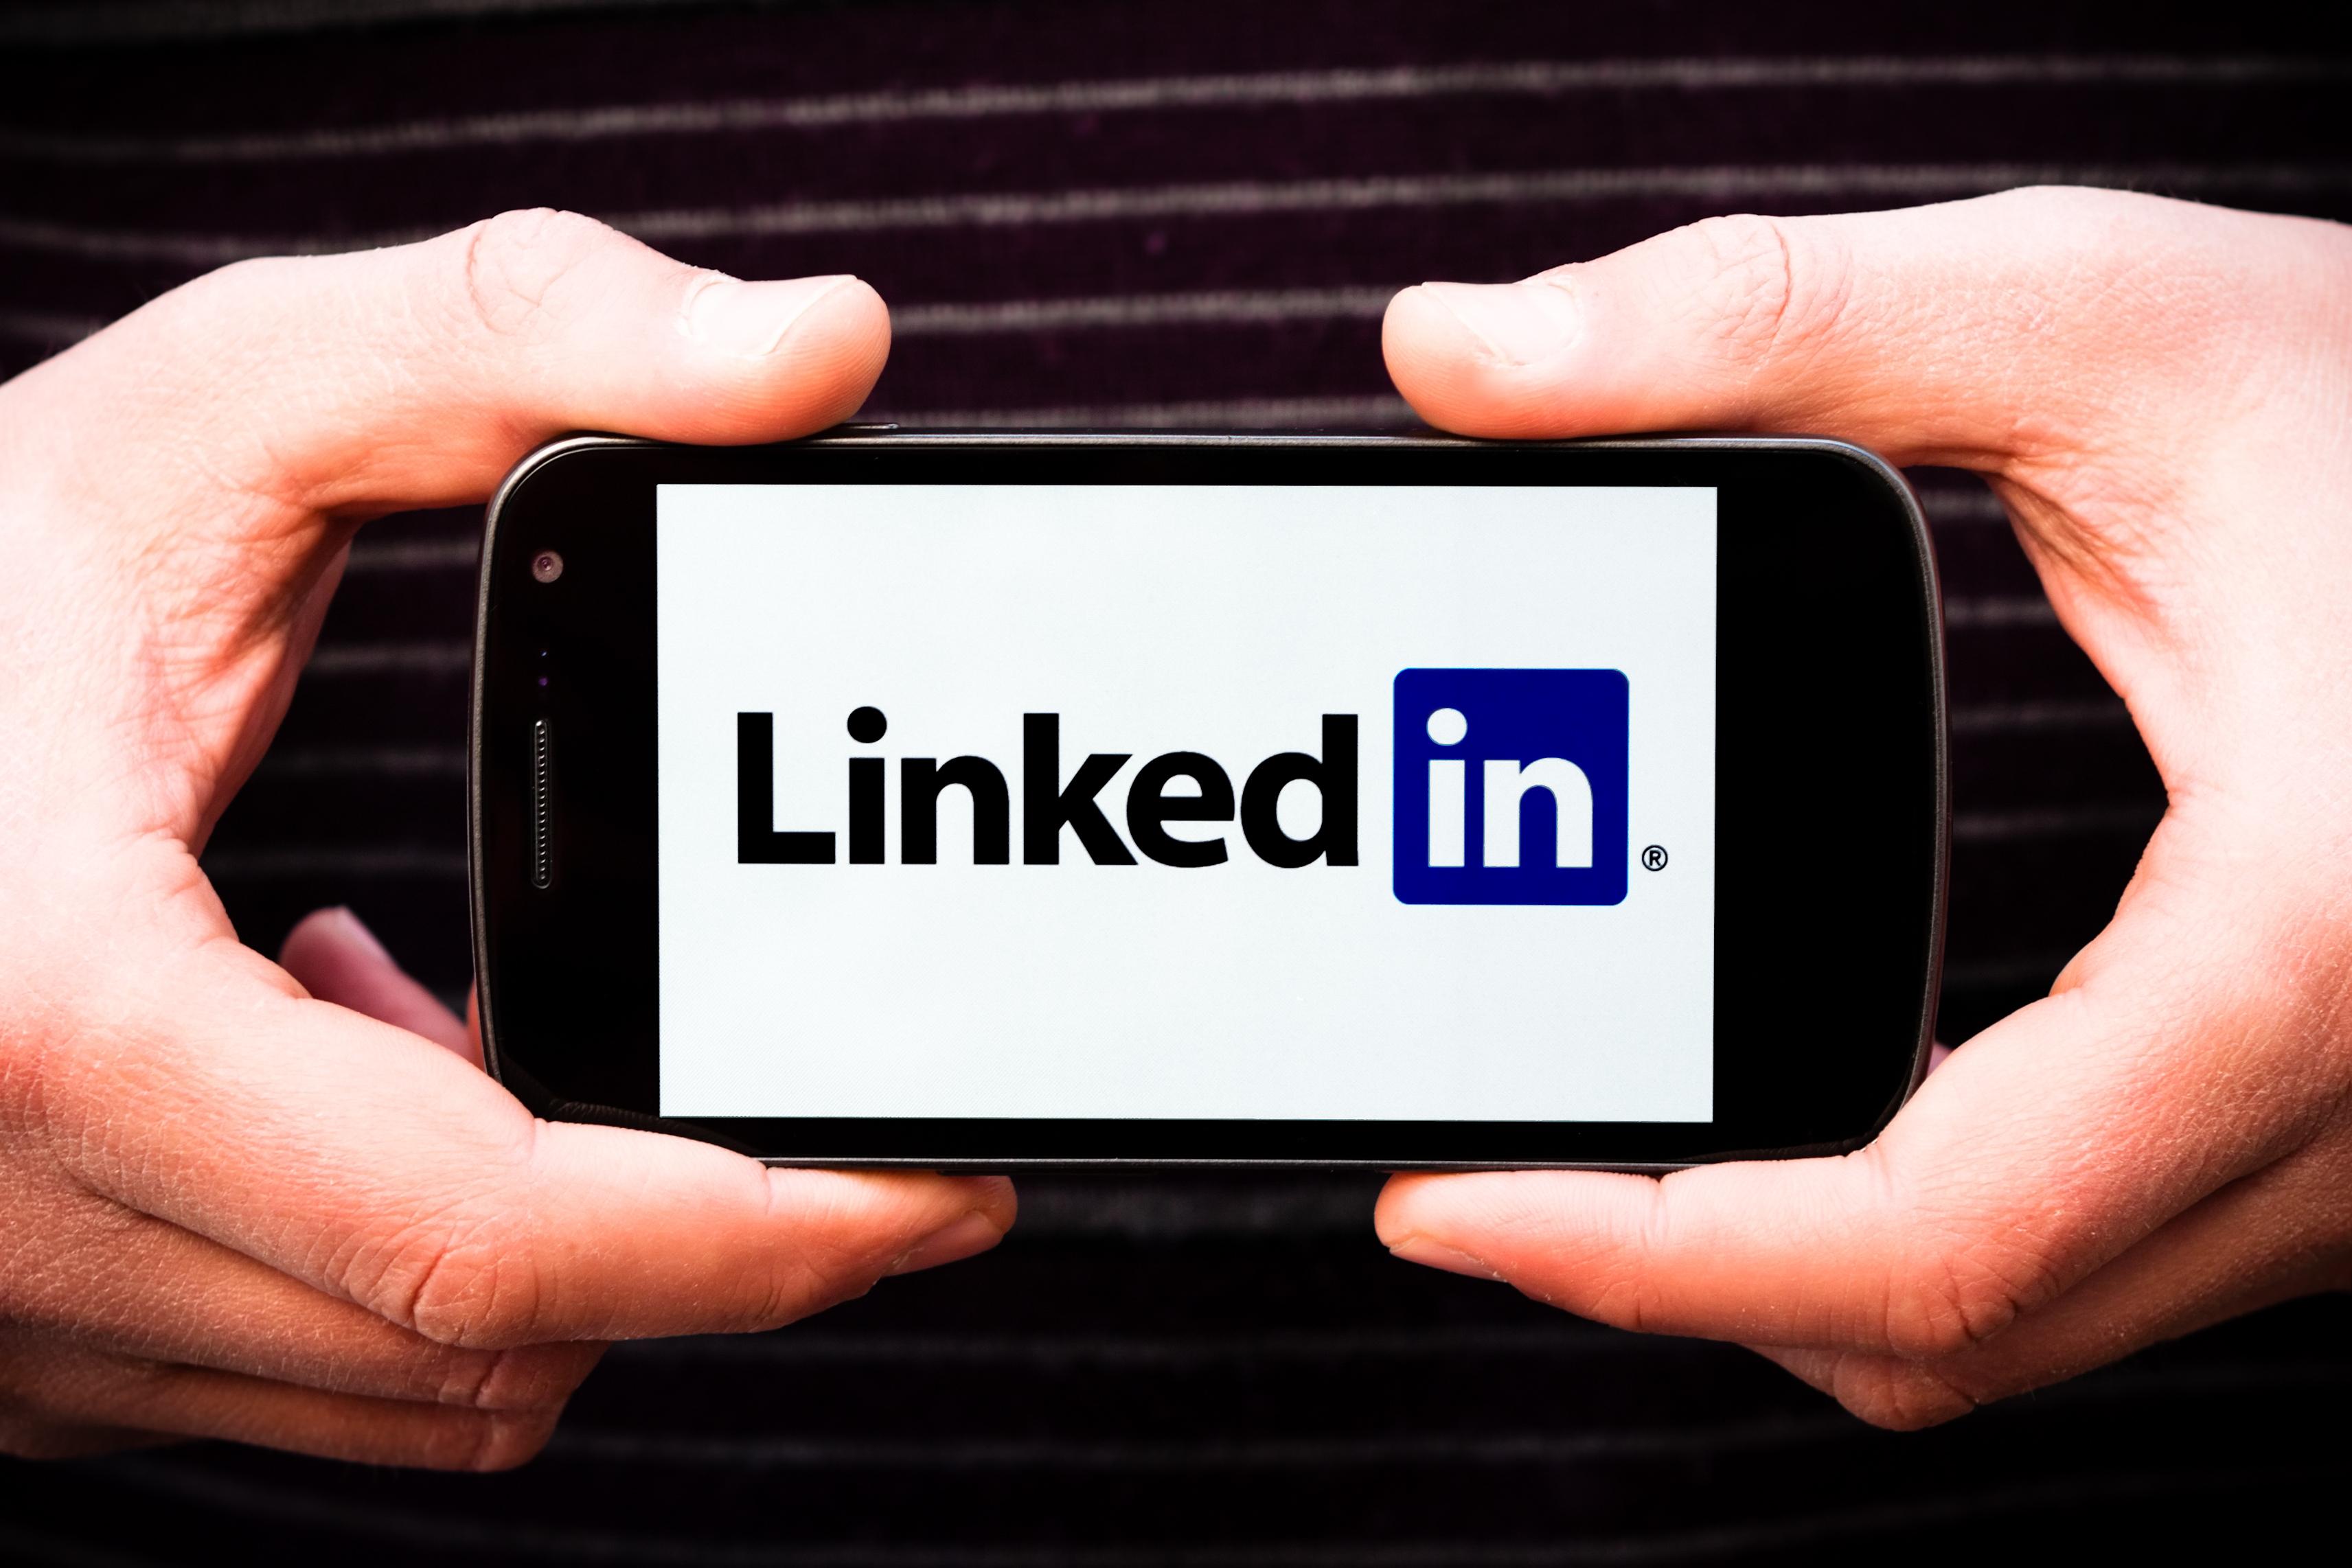 LinkedIn Focusing on Video Marketing